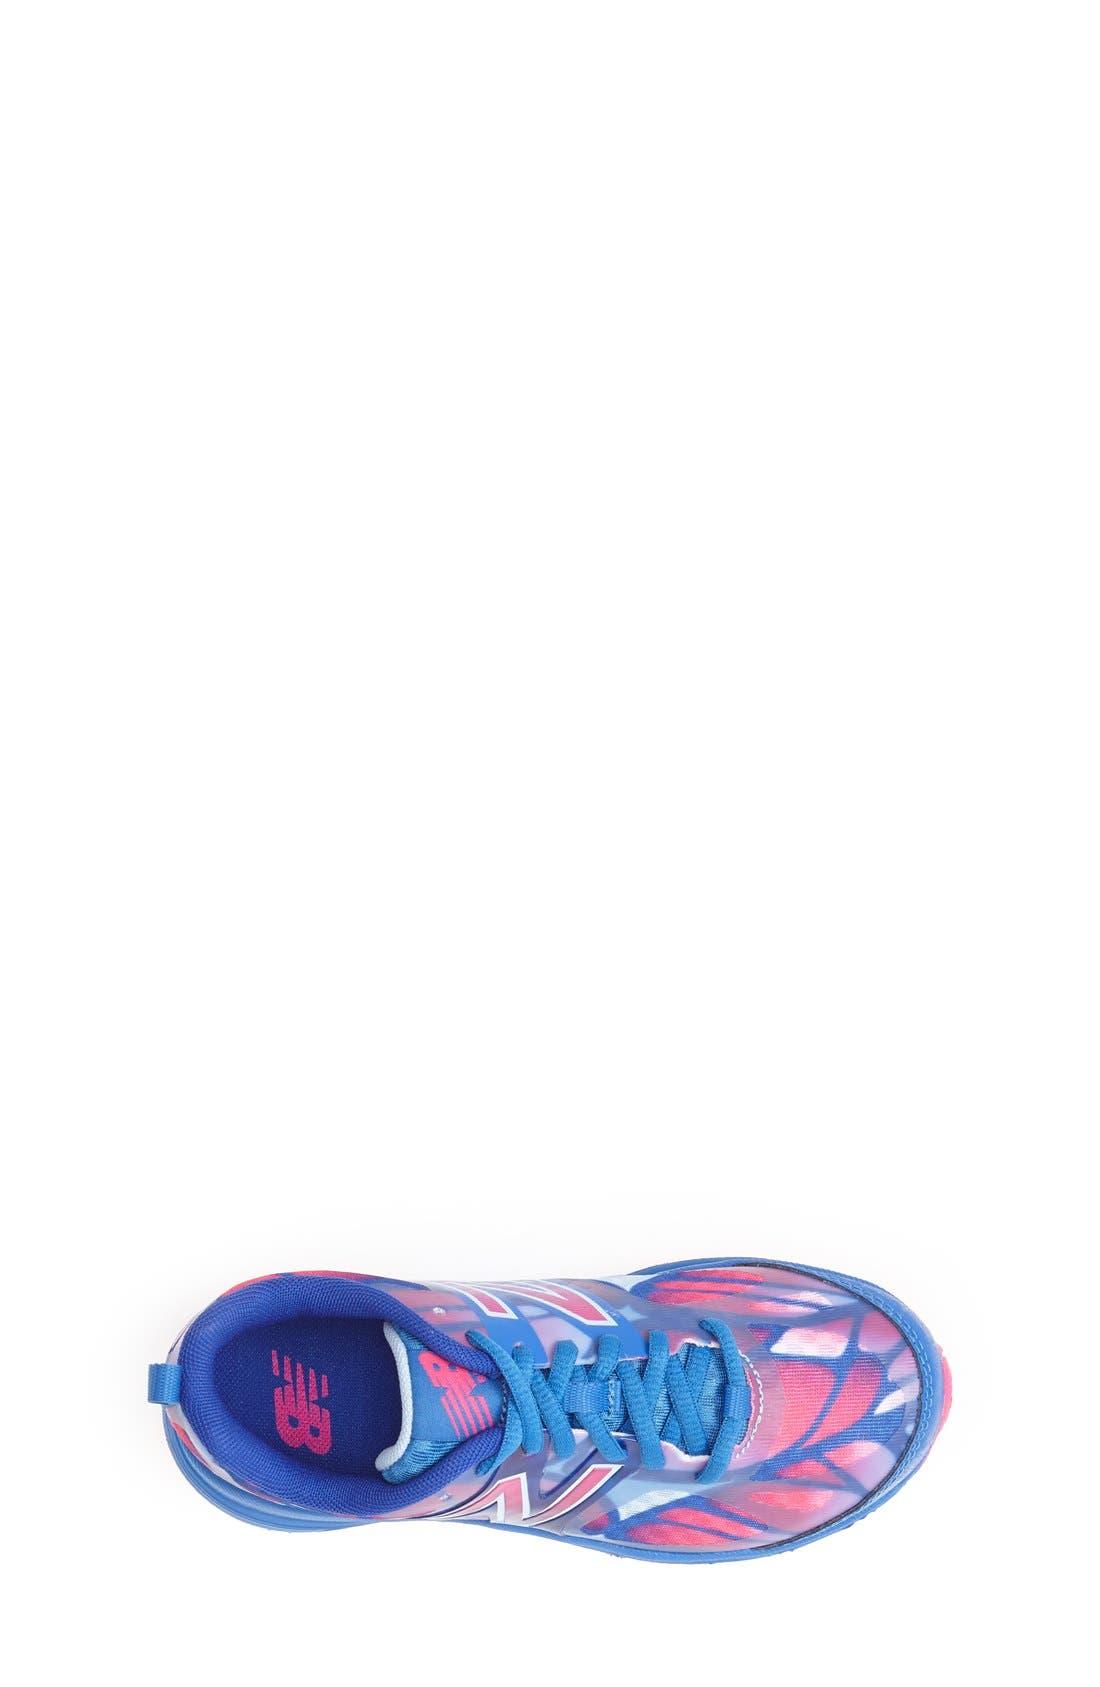 Alternate Image 3  - New Balance 'Update 890 Beetles & Butterfly' Athletic Shoe (Toddler, Little Kid & Big Kid)